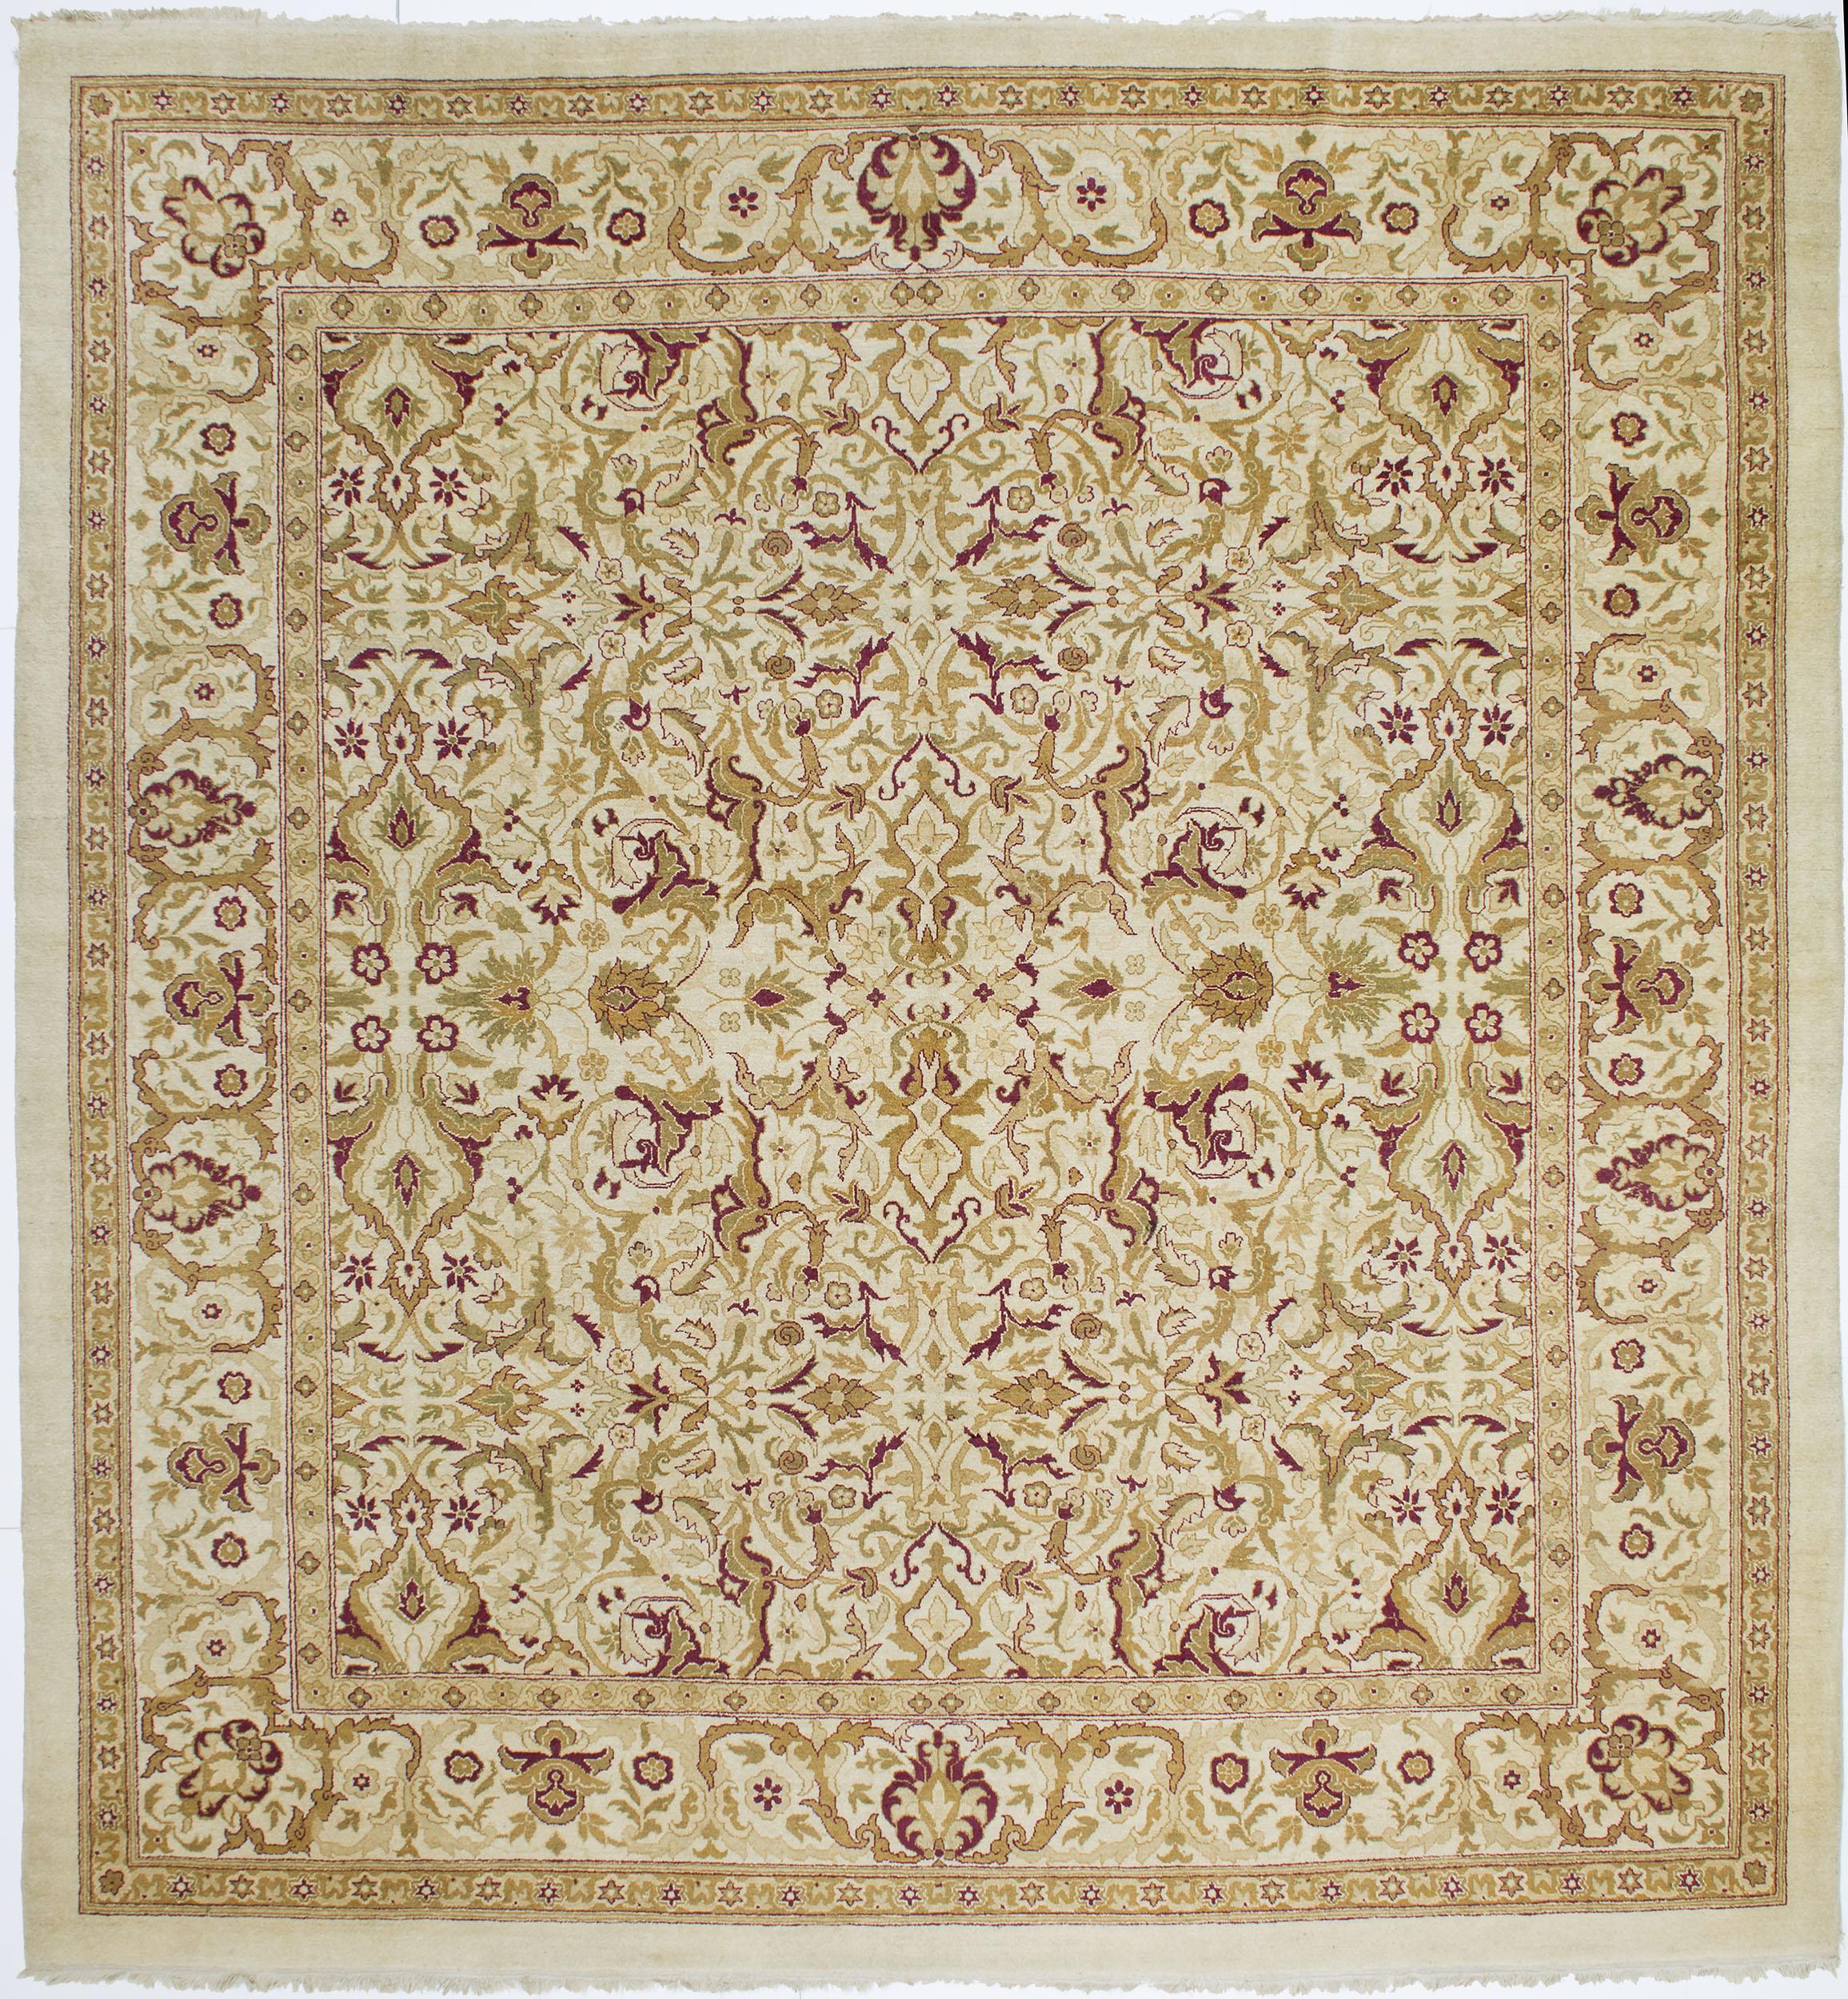 "Copy of Amritsar Carpet 10' 10"" x 10' 1"""